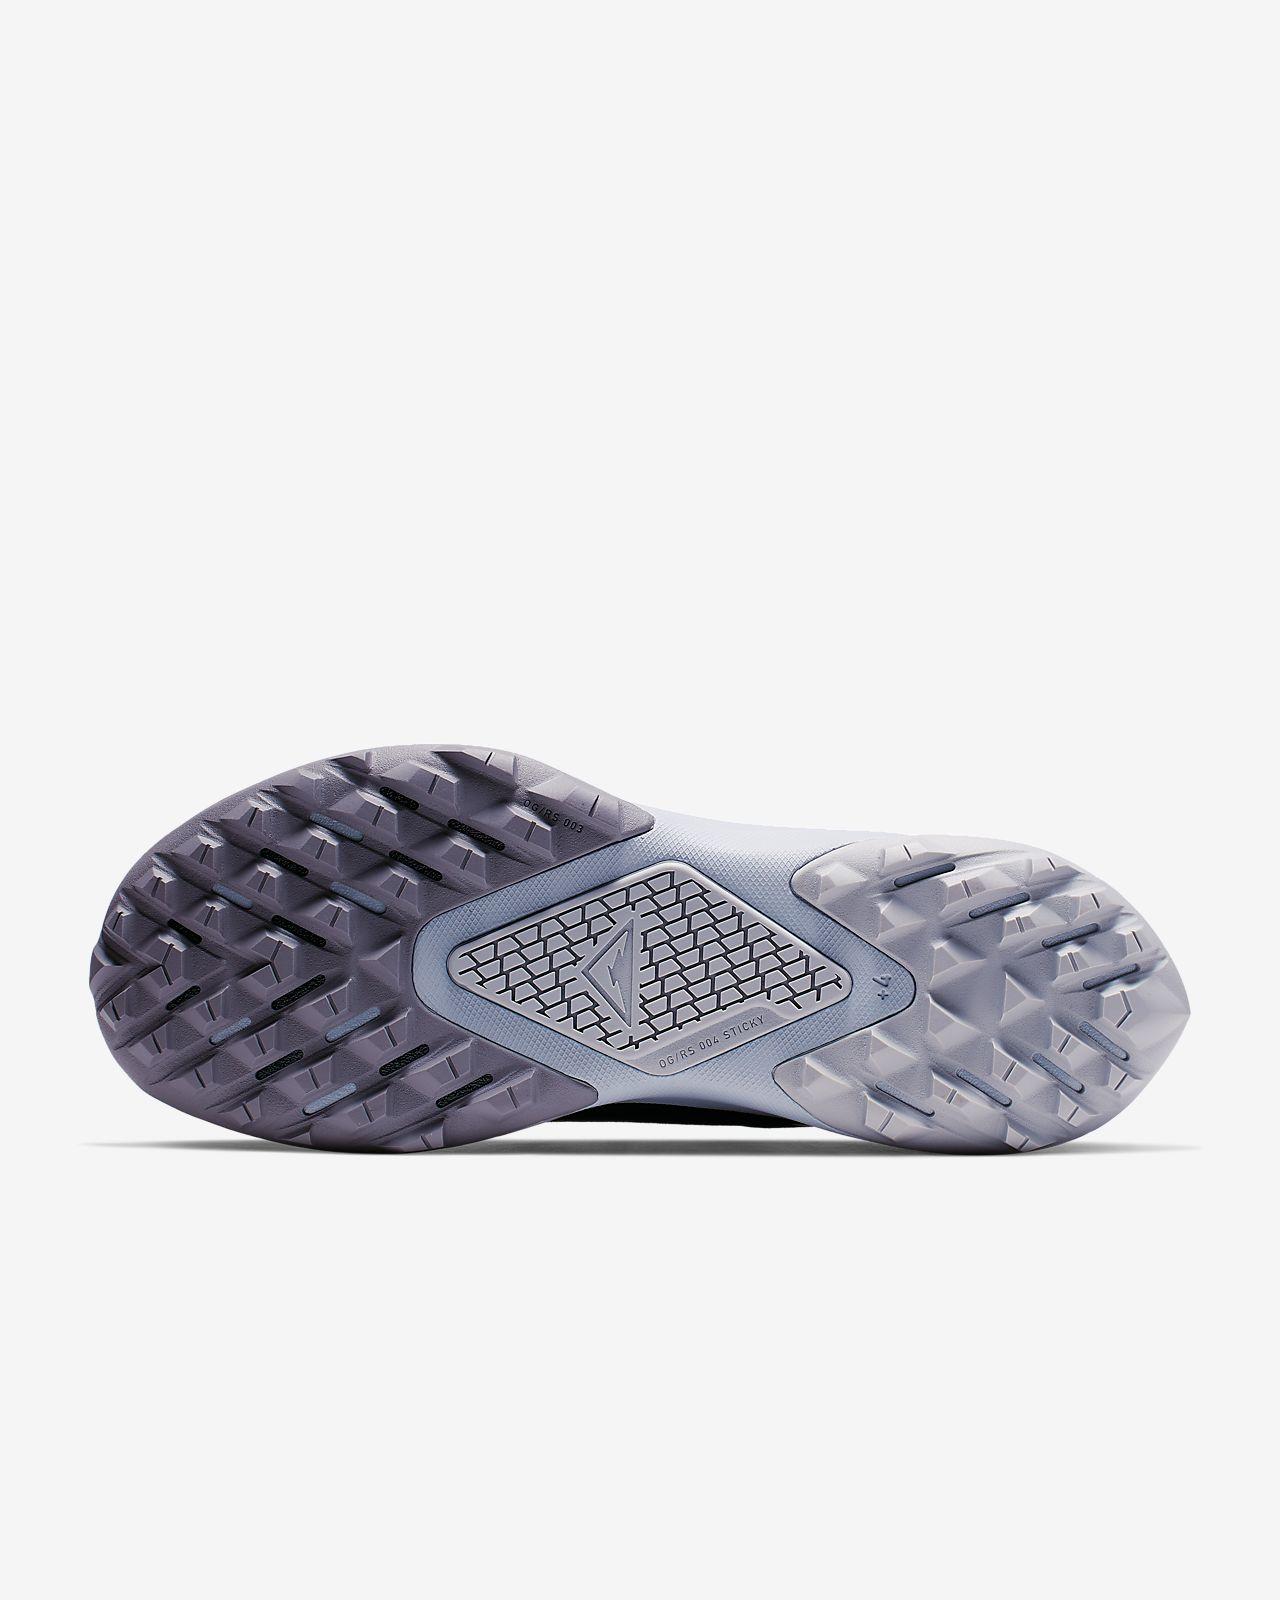 8e90c0db12d Ανδρικό παπούτσι για τρέξιμο Nike Air Zoom Terra Kiger 5. Nike.com GR